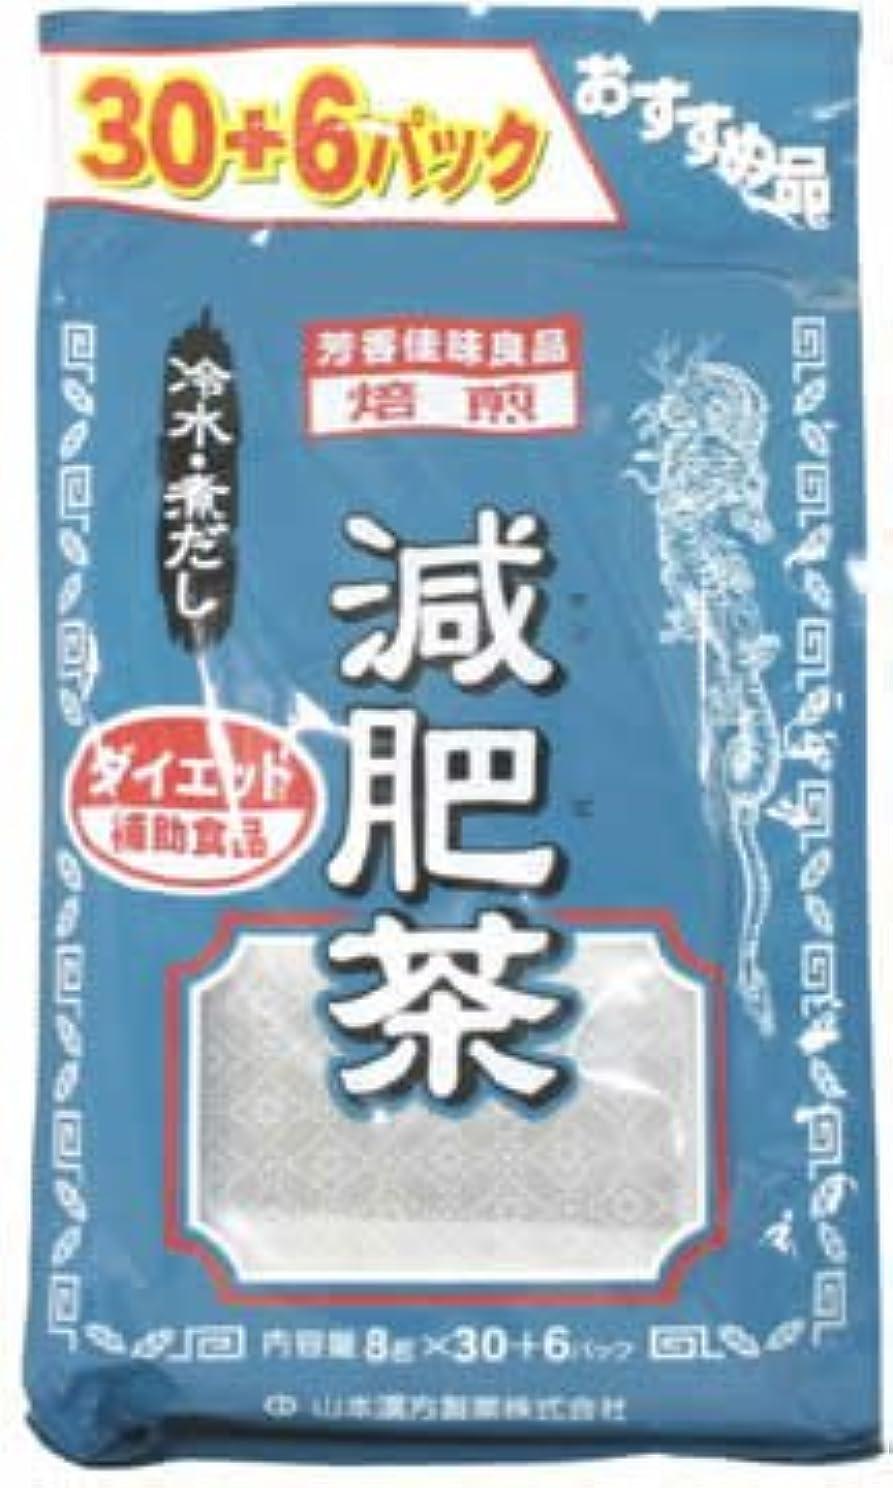 野望記憶良さ山本漢方製薬 お徳用減肥茶36包 8gX36H